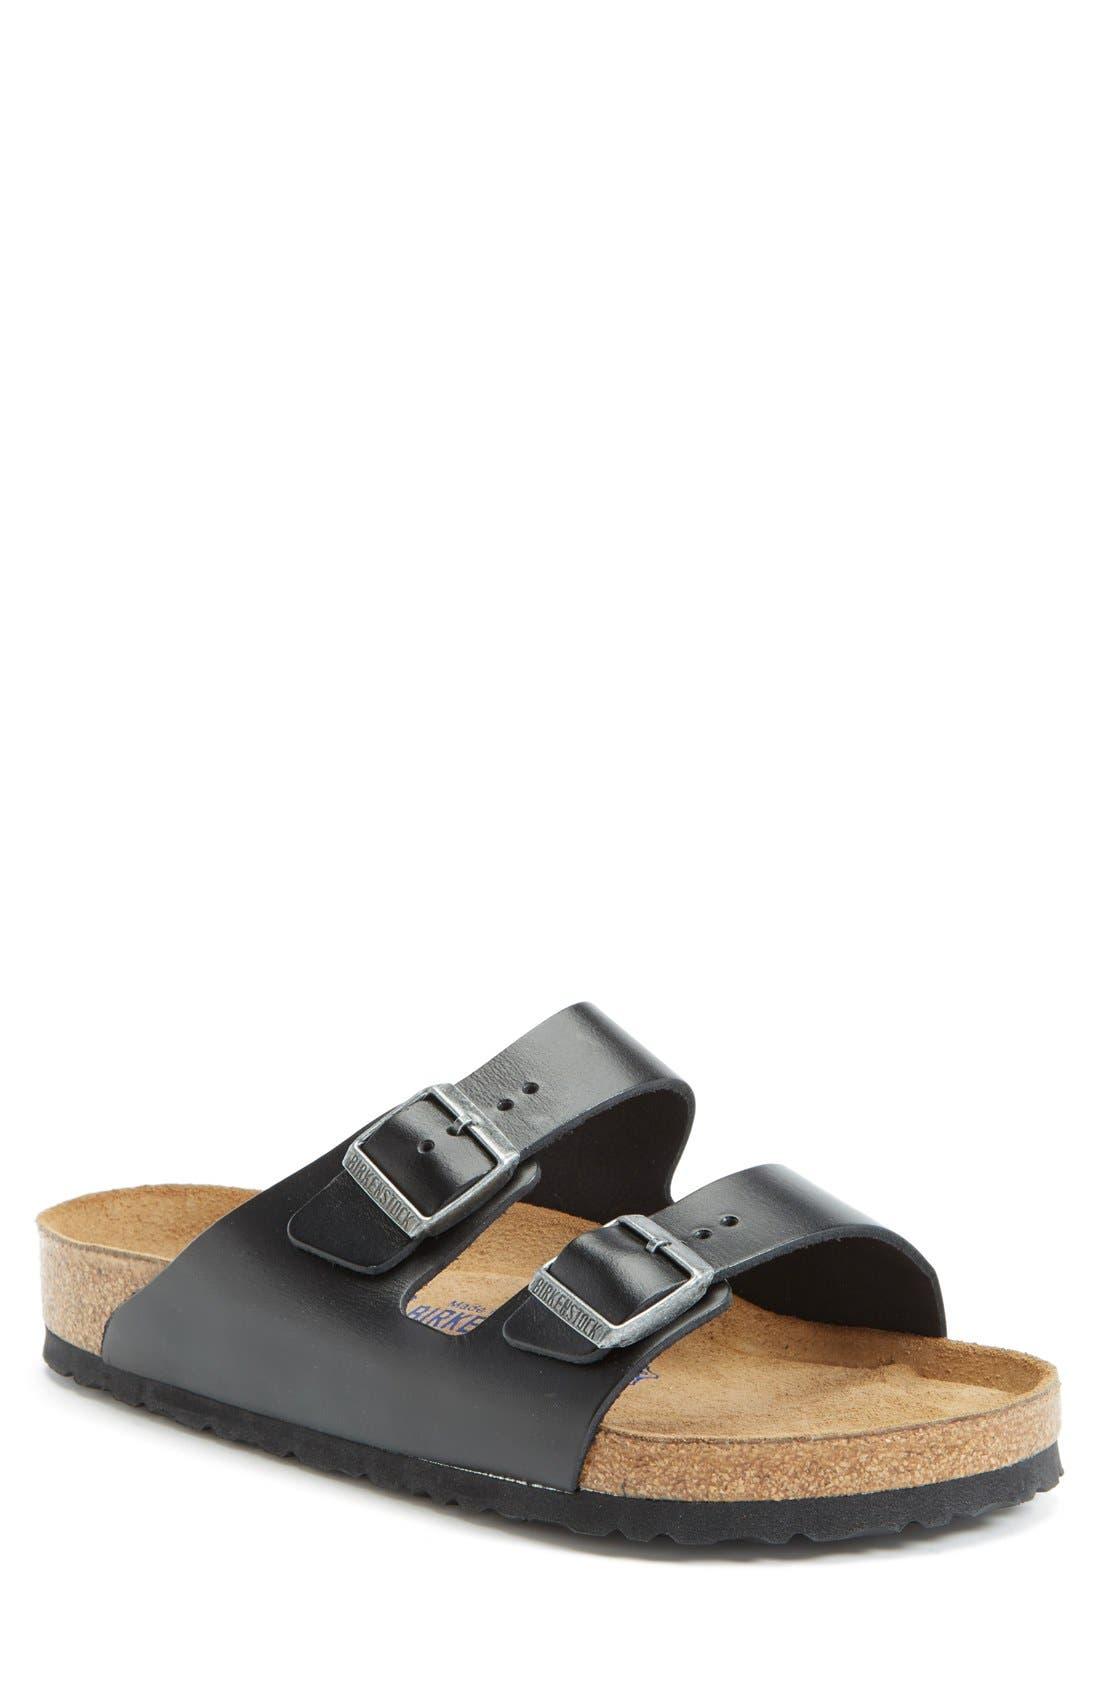 BIRKENSTOCK 'Arizona Soft' Sandal, Main, color, BLACK